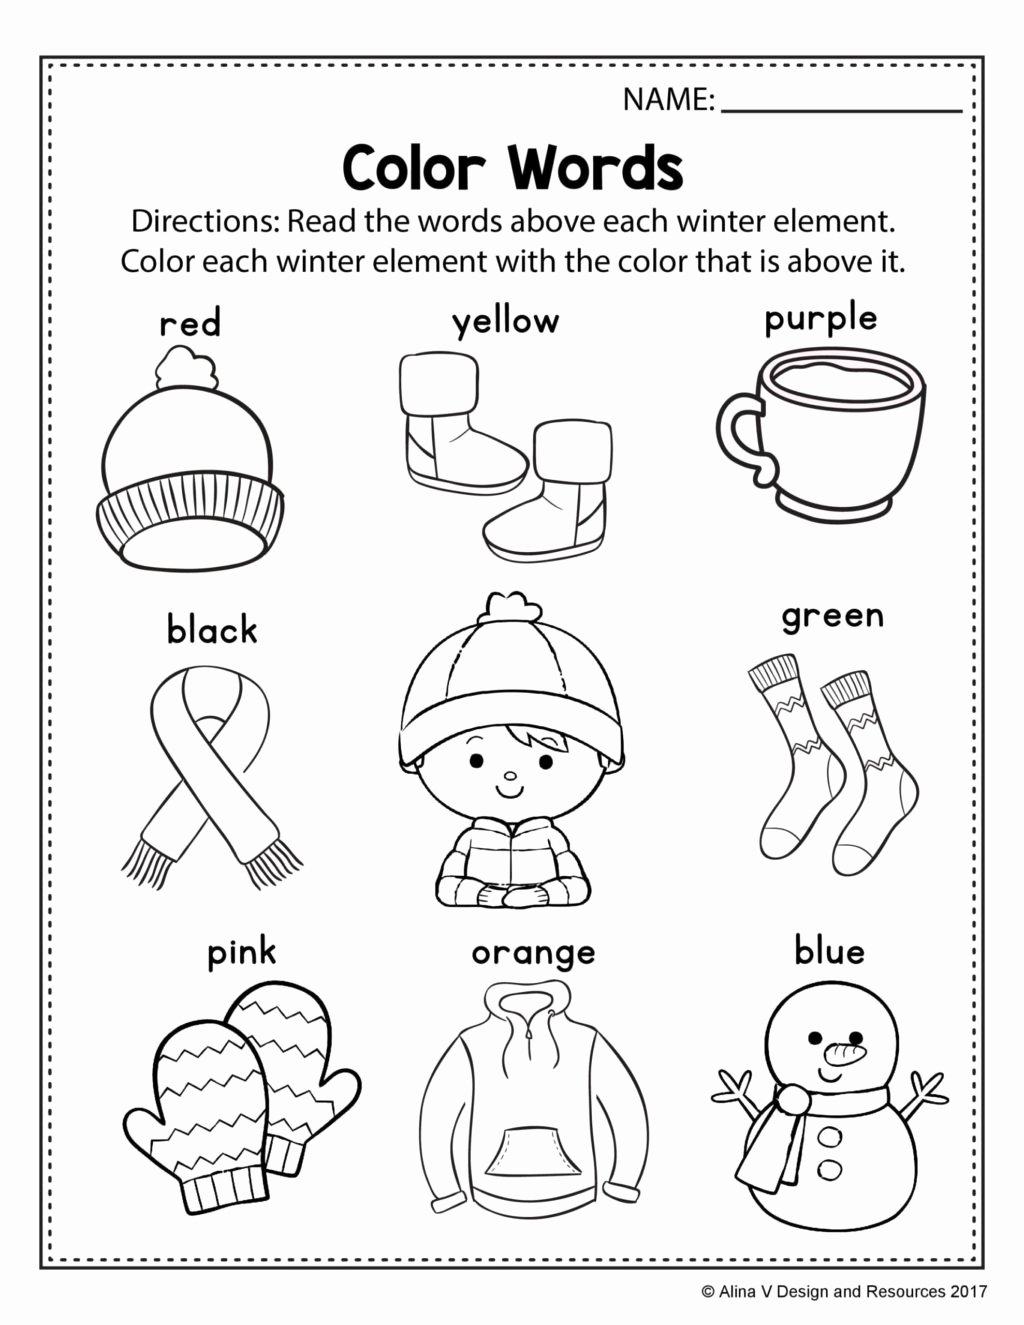 Orange Worksheets for Preschoolers New Free Coloring Printables for Preschoolers Outstanding